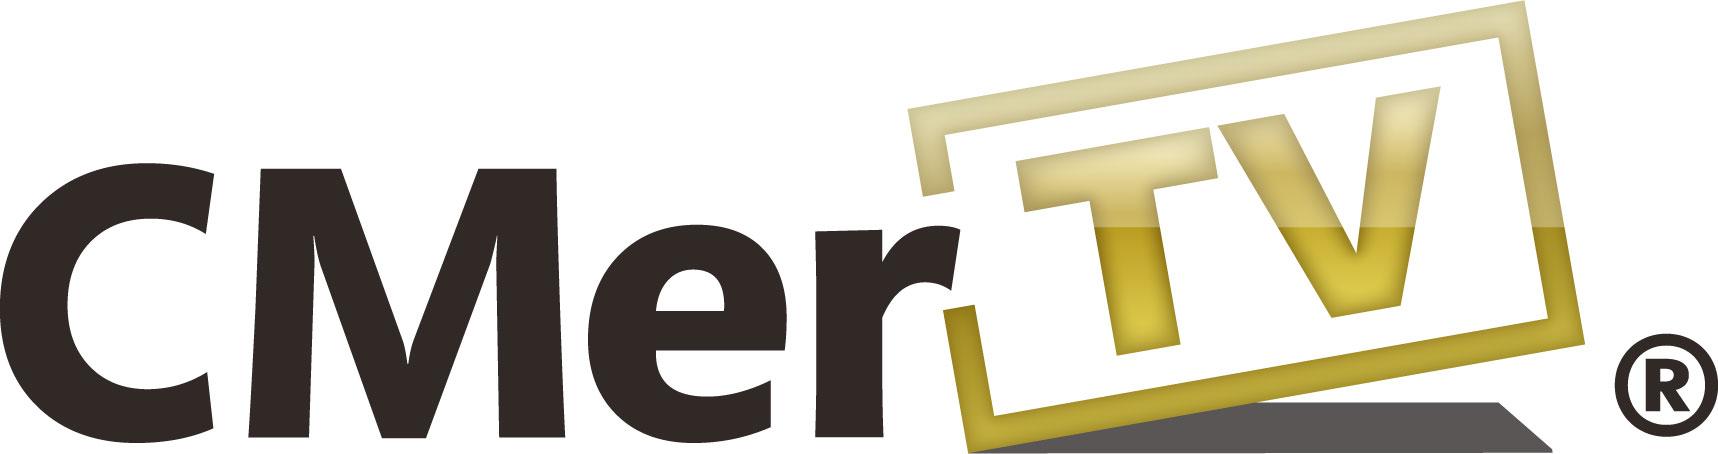 logo_color_b